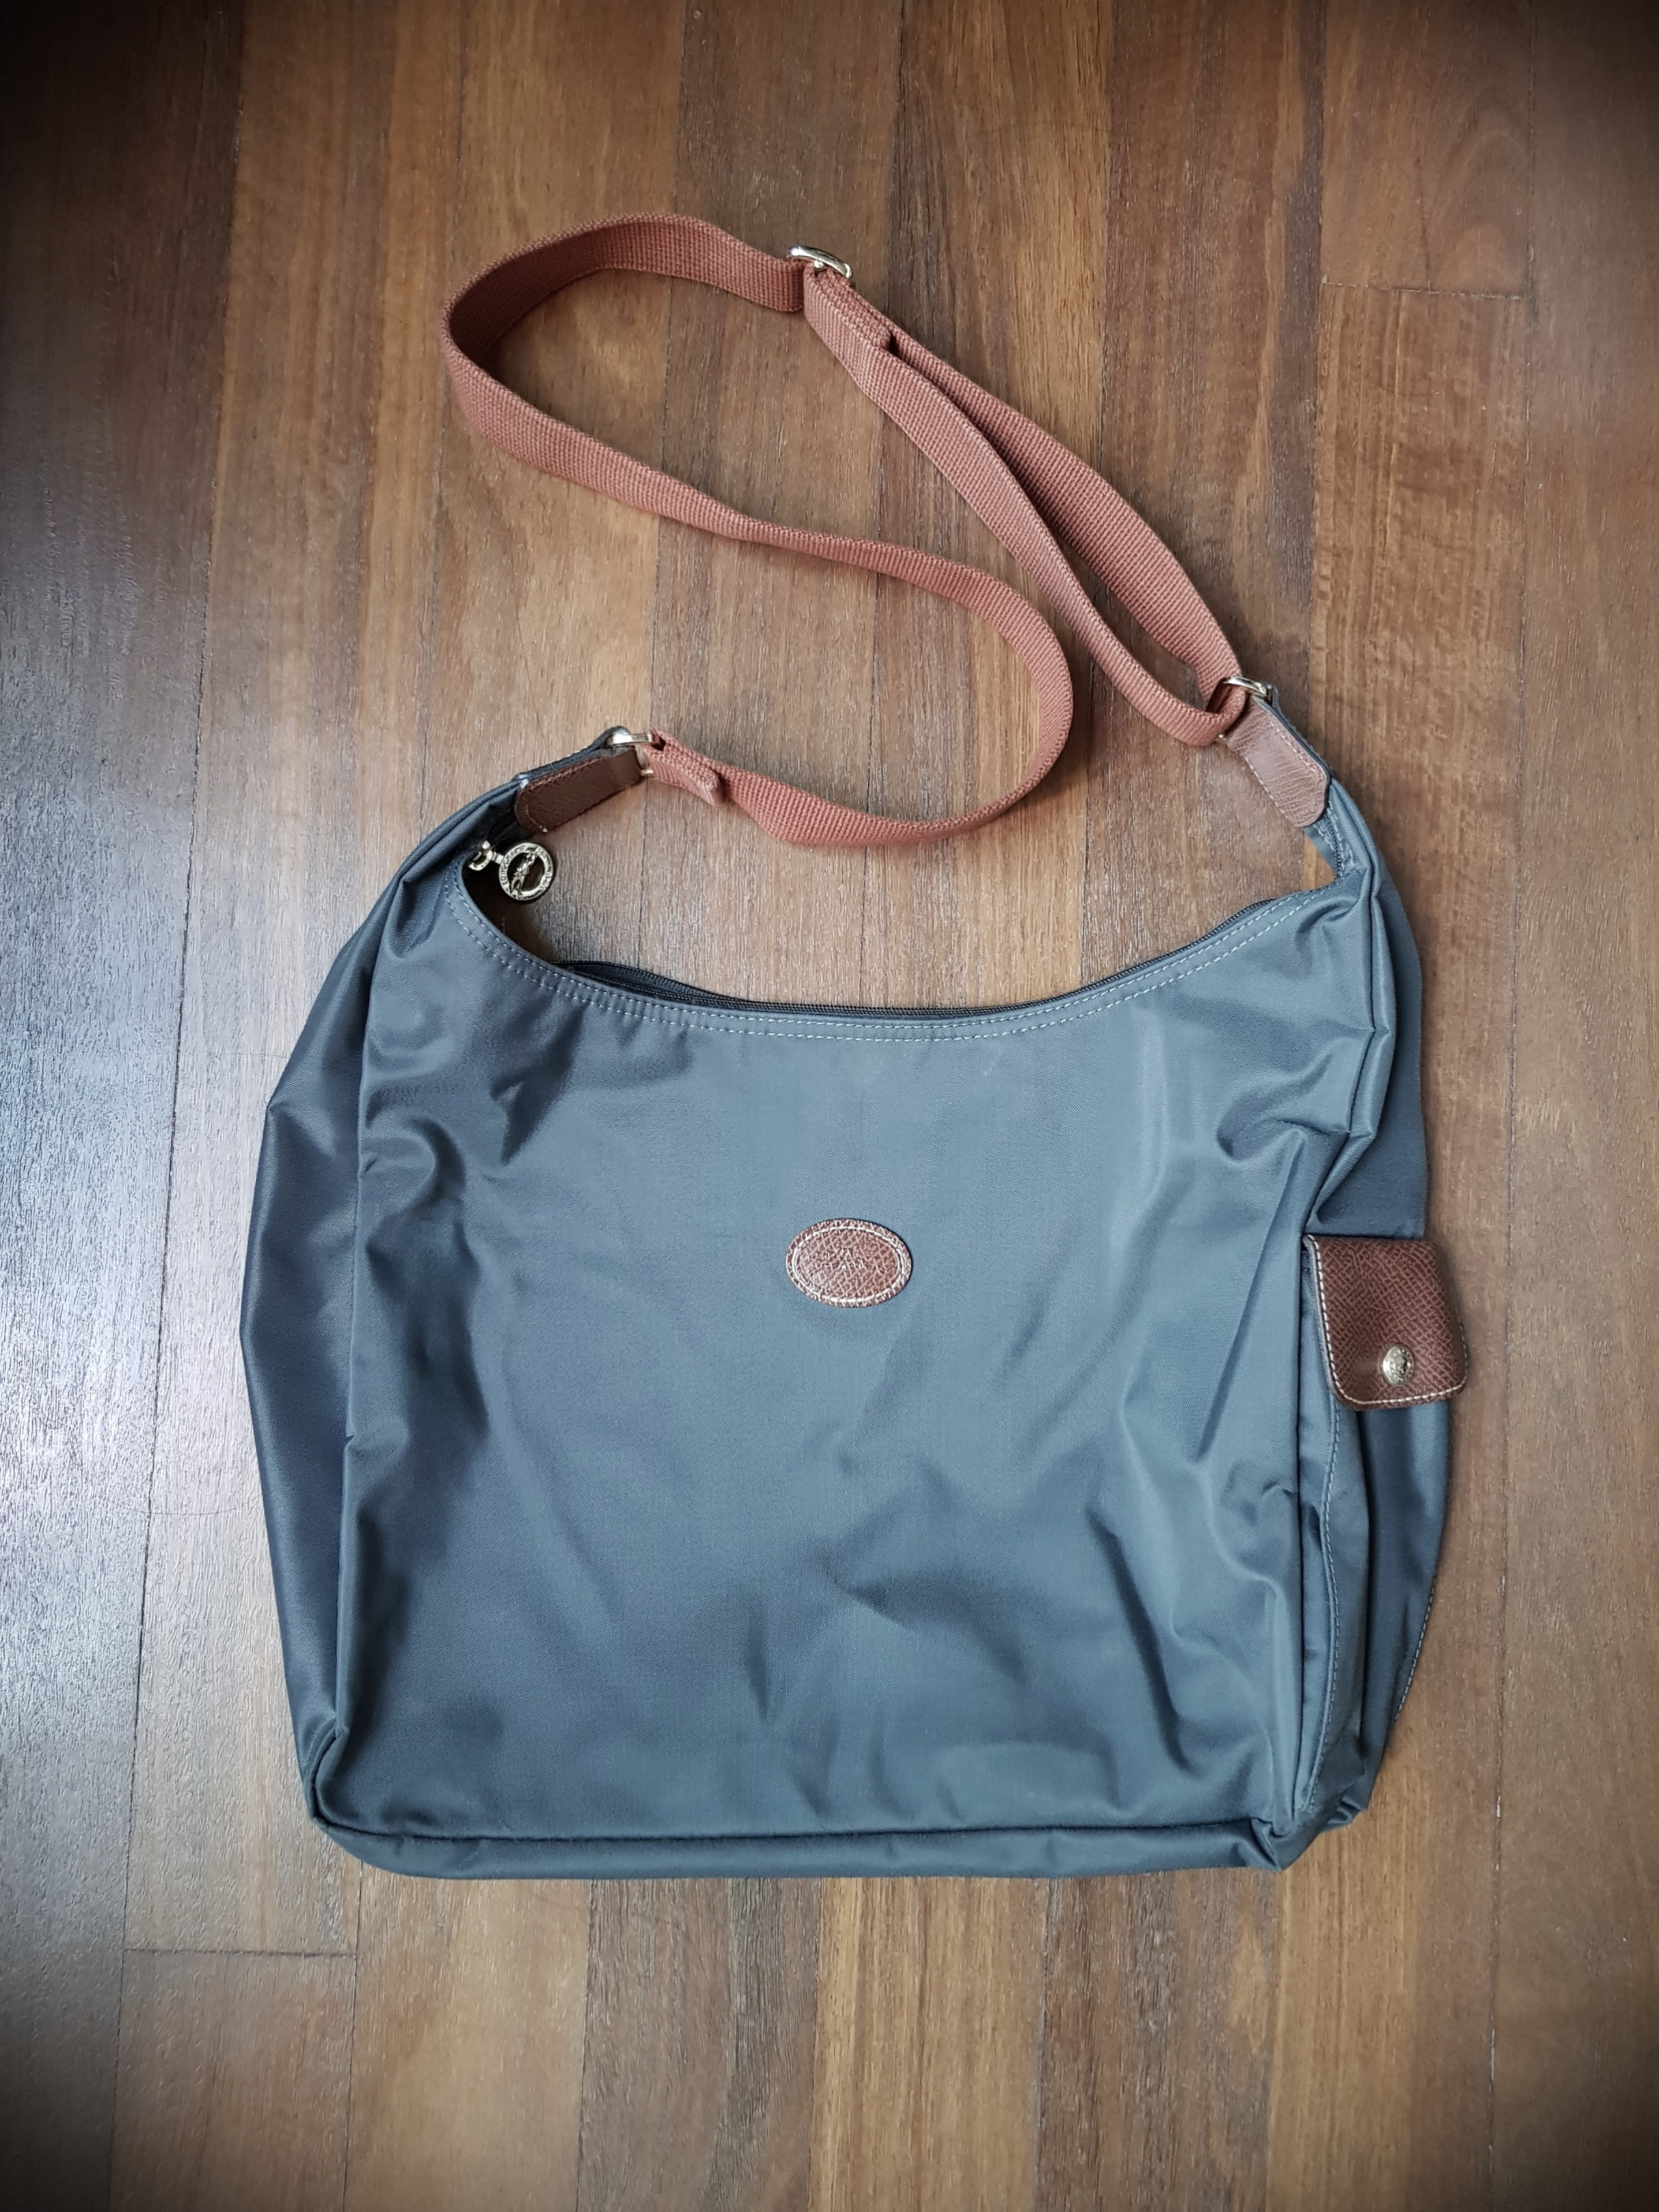 6d54bdc6ed6d 👜 Longchamp Le Pliage Hobo Bag